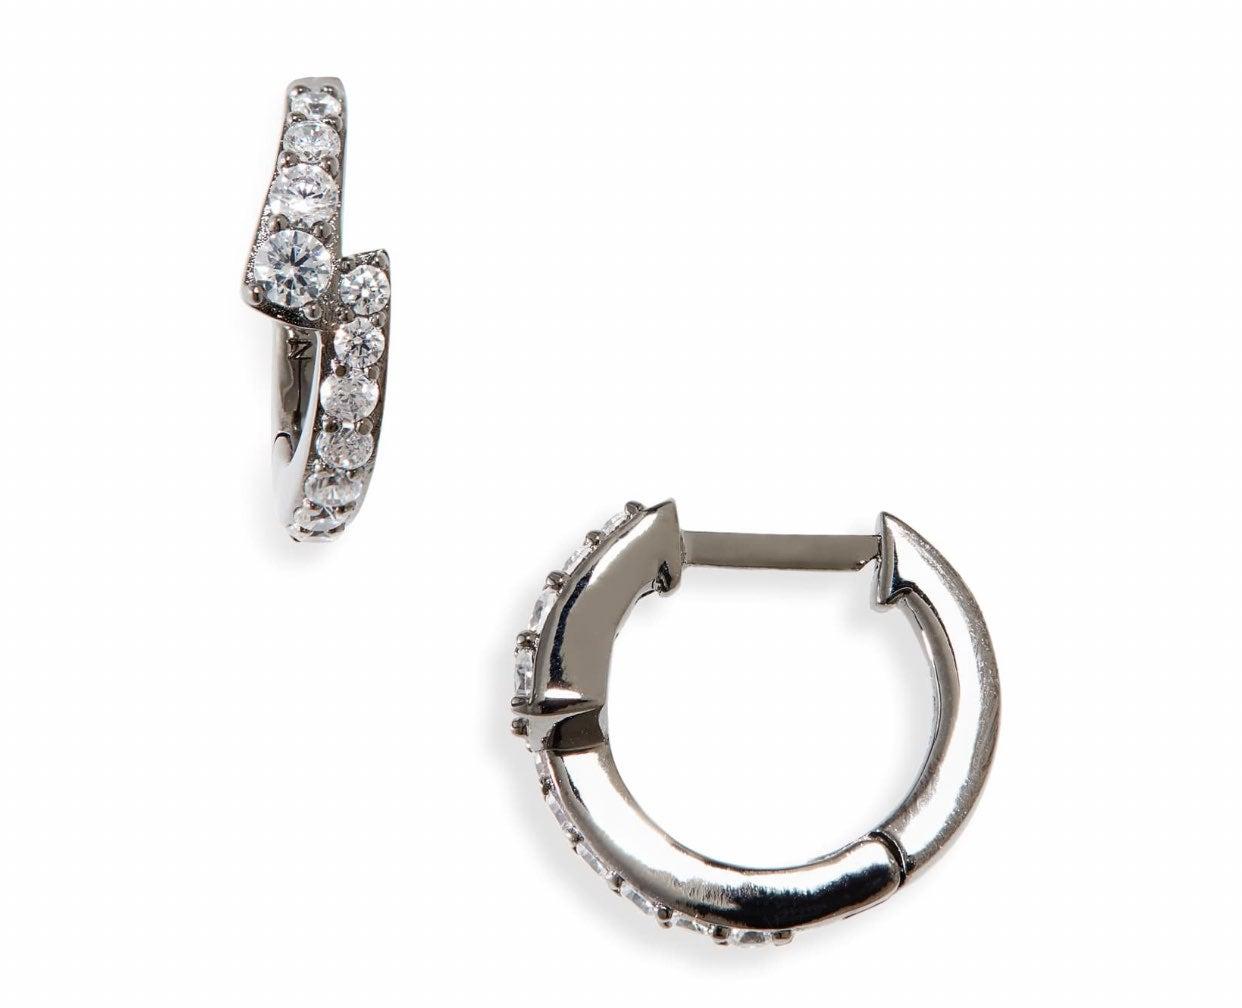 NADRI CZ Small Huggie Earrings